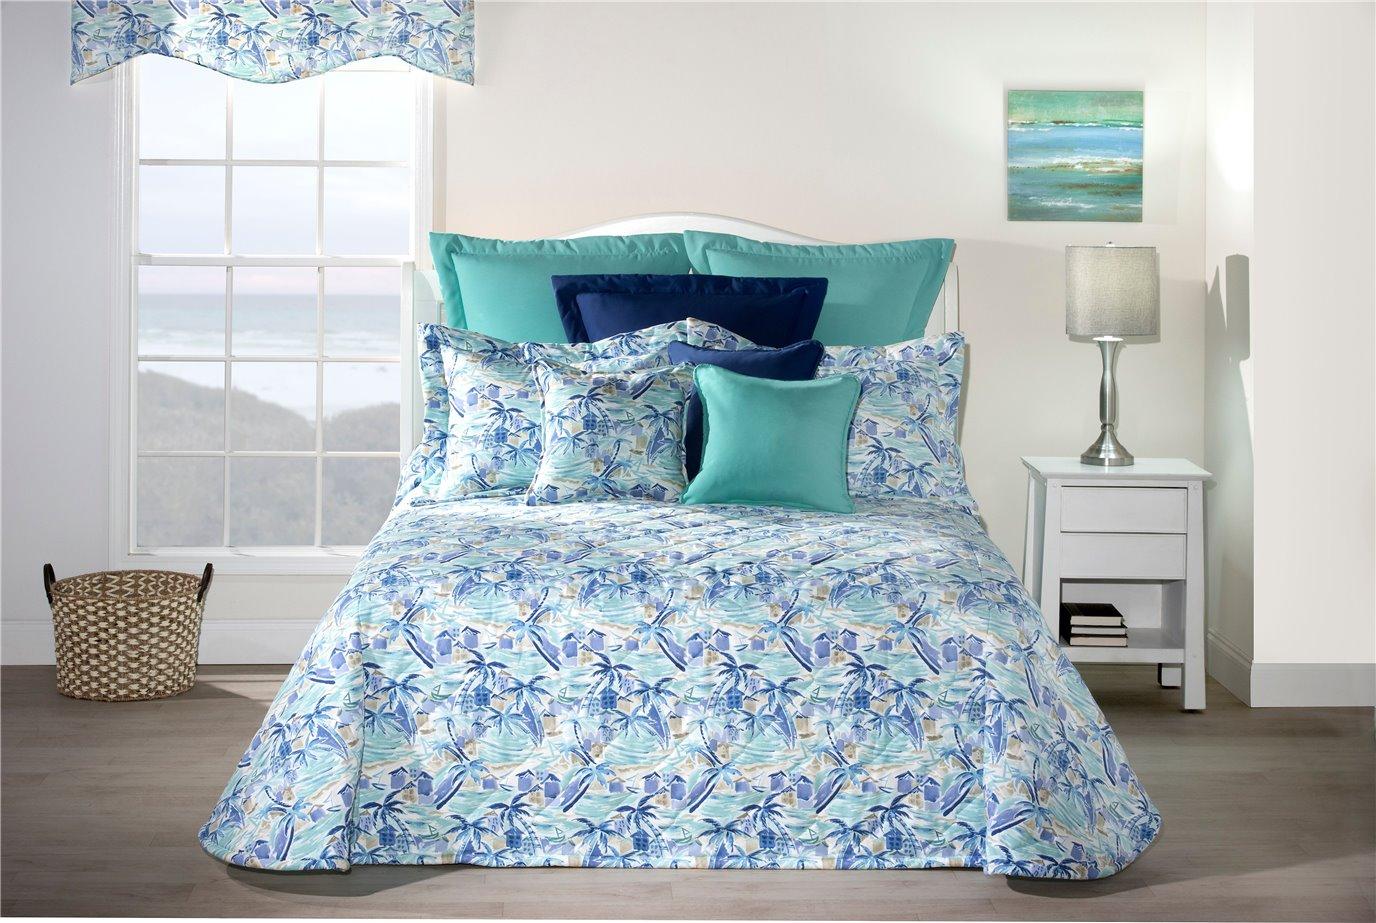 Tropical Paradise Blue King Bedspread